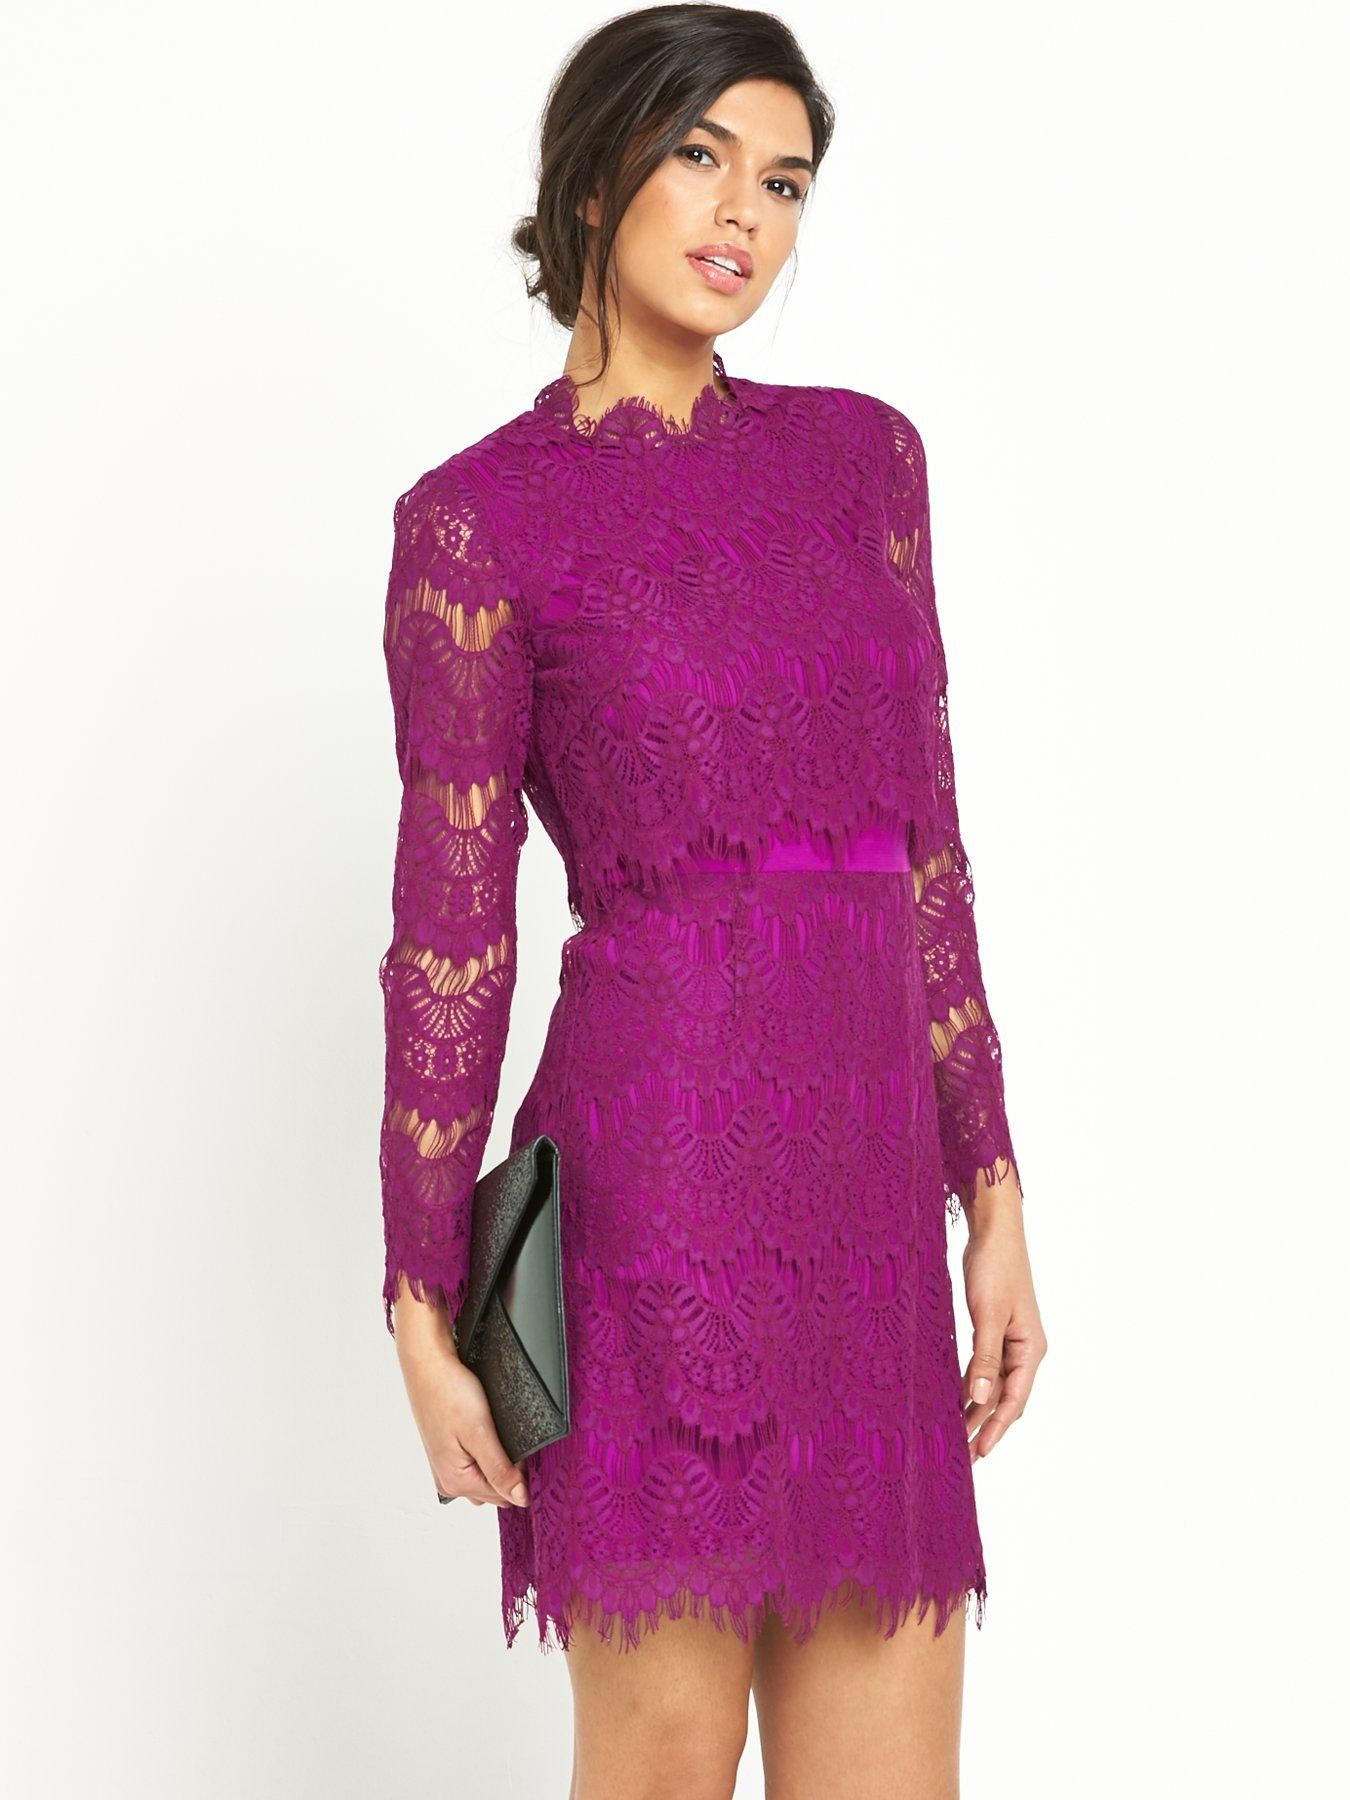 Lujo Littlewoods Wedding Dress Ideas Ornamento Elaboración ...